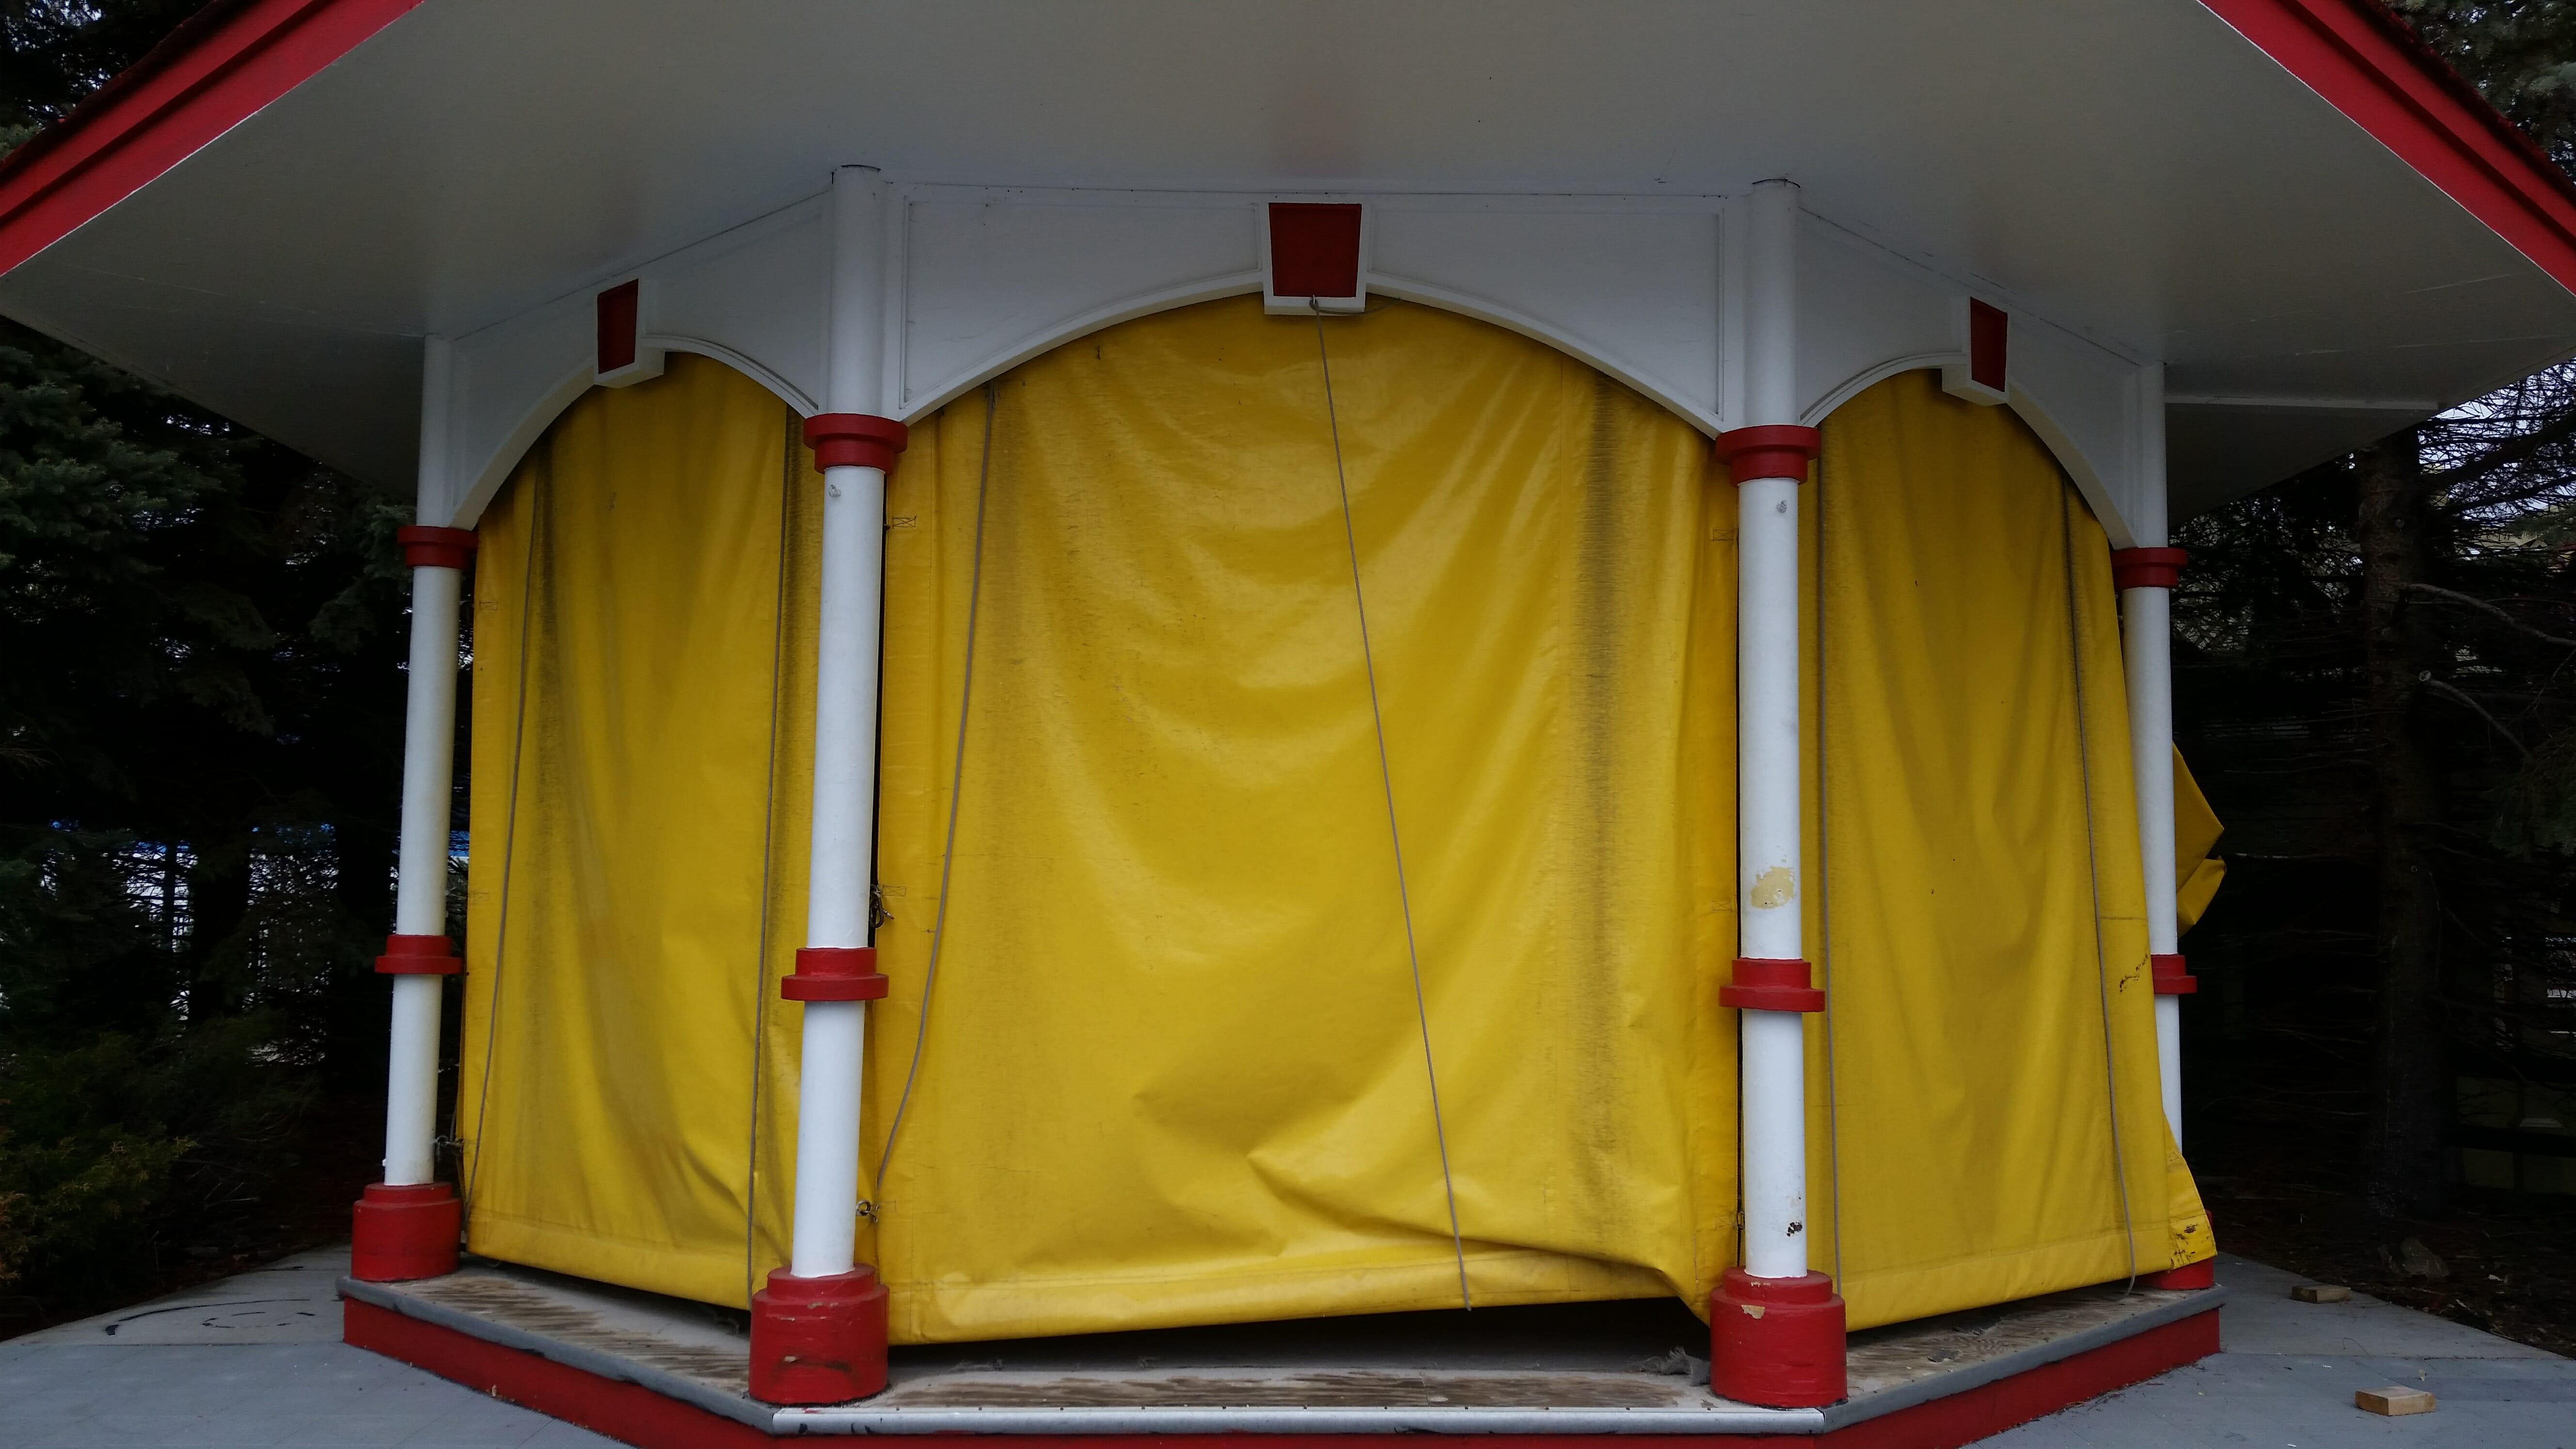 Valleyfair Gazebo Curtains Shakopee Mn